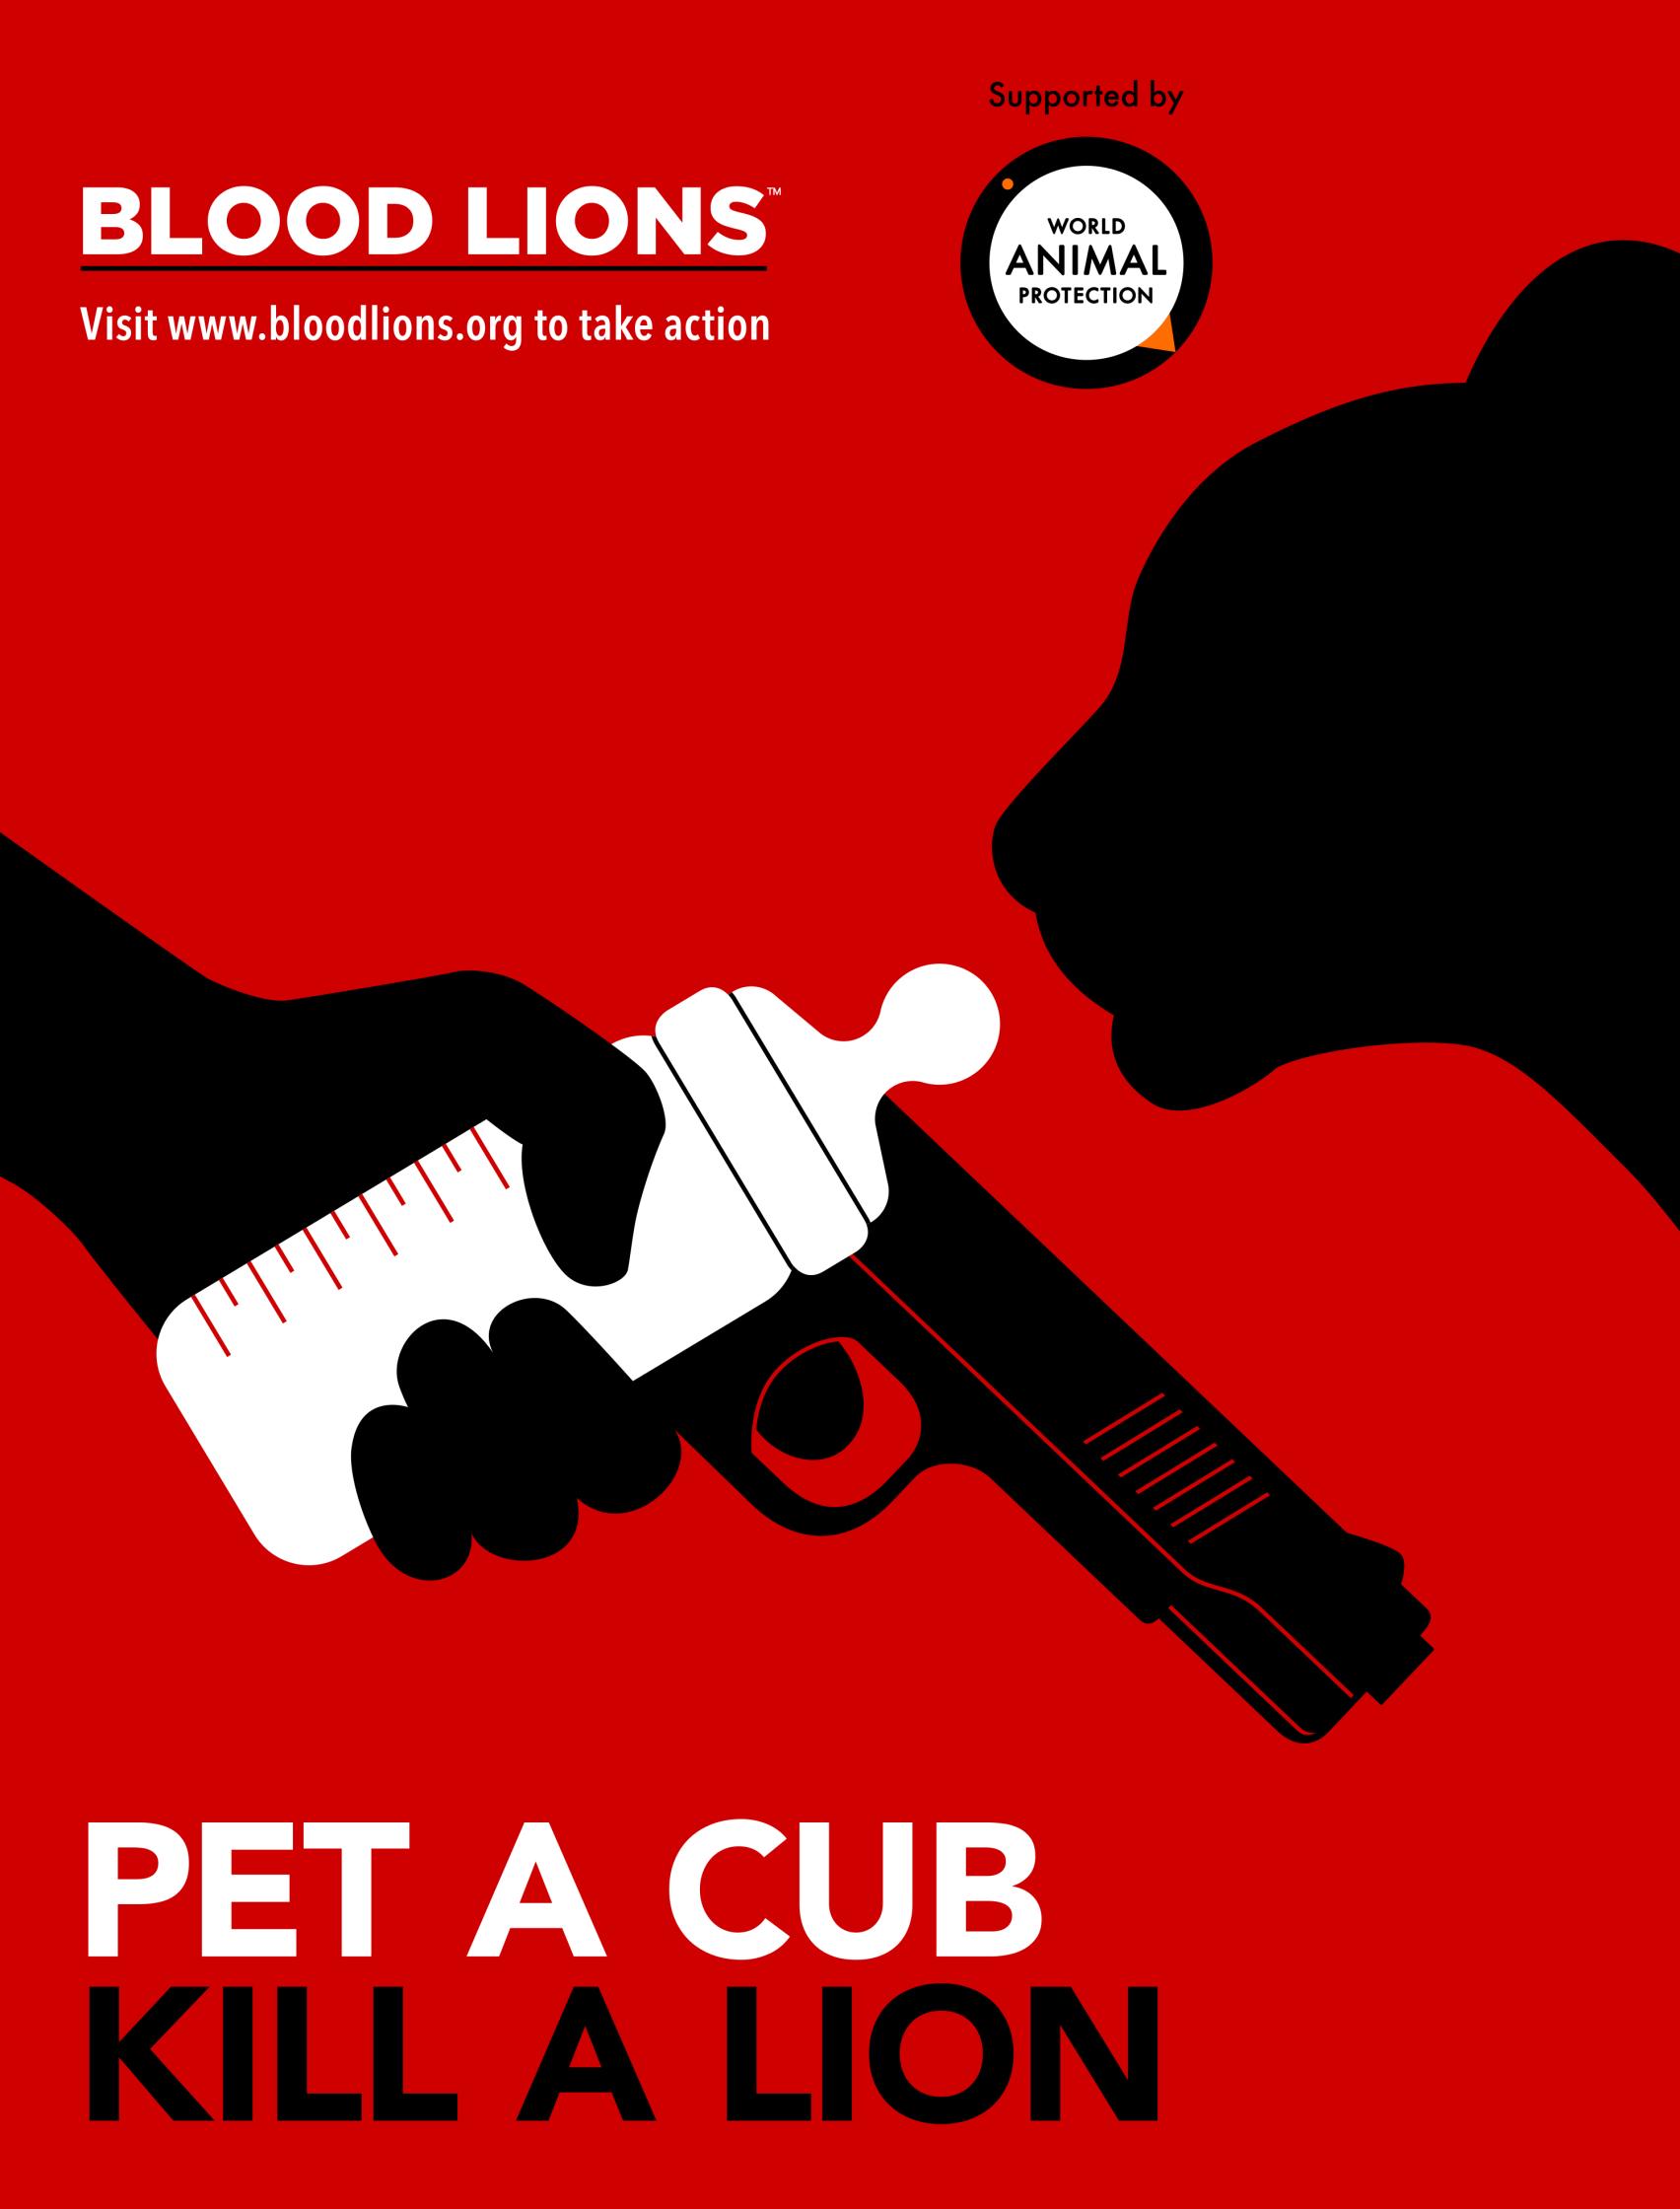 BloodLions-Cub-Petting.jpg